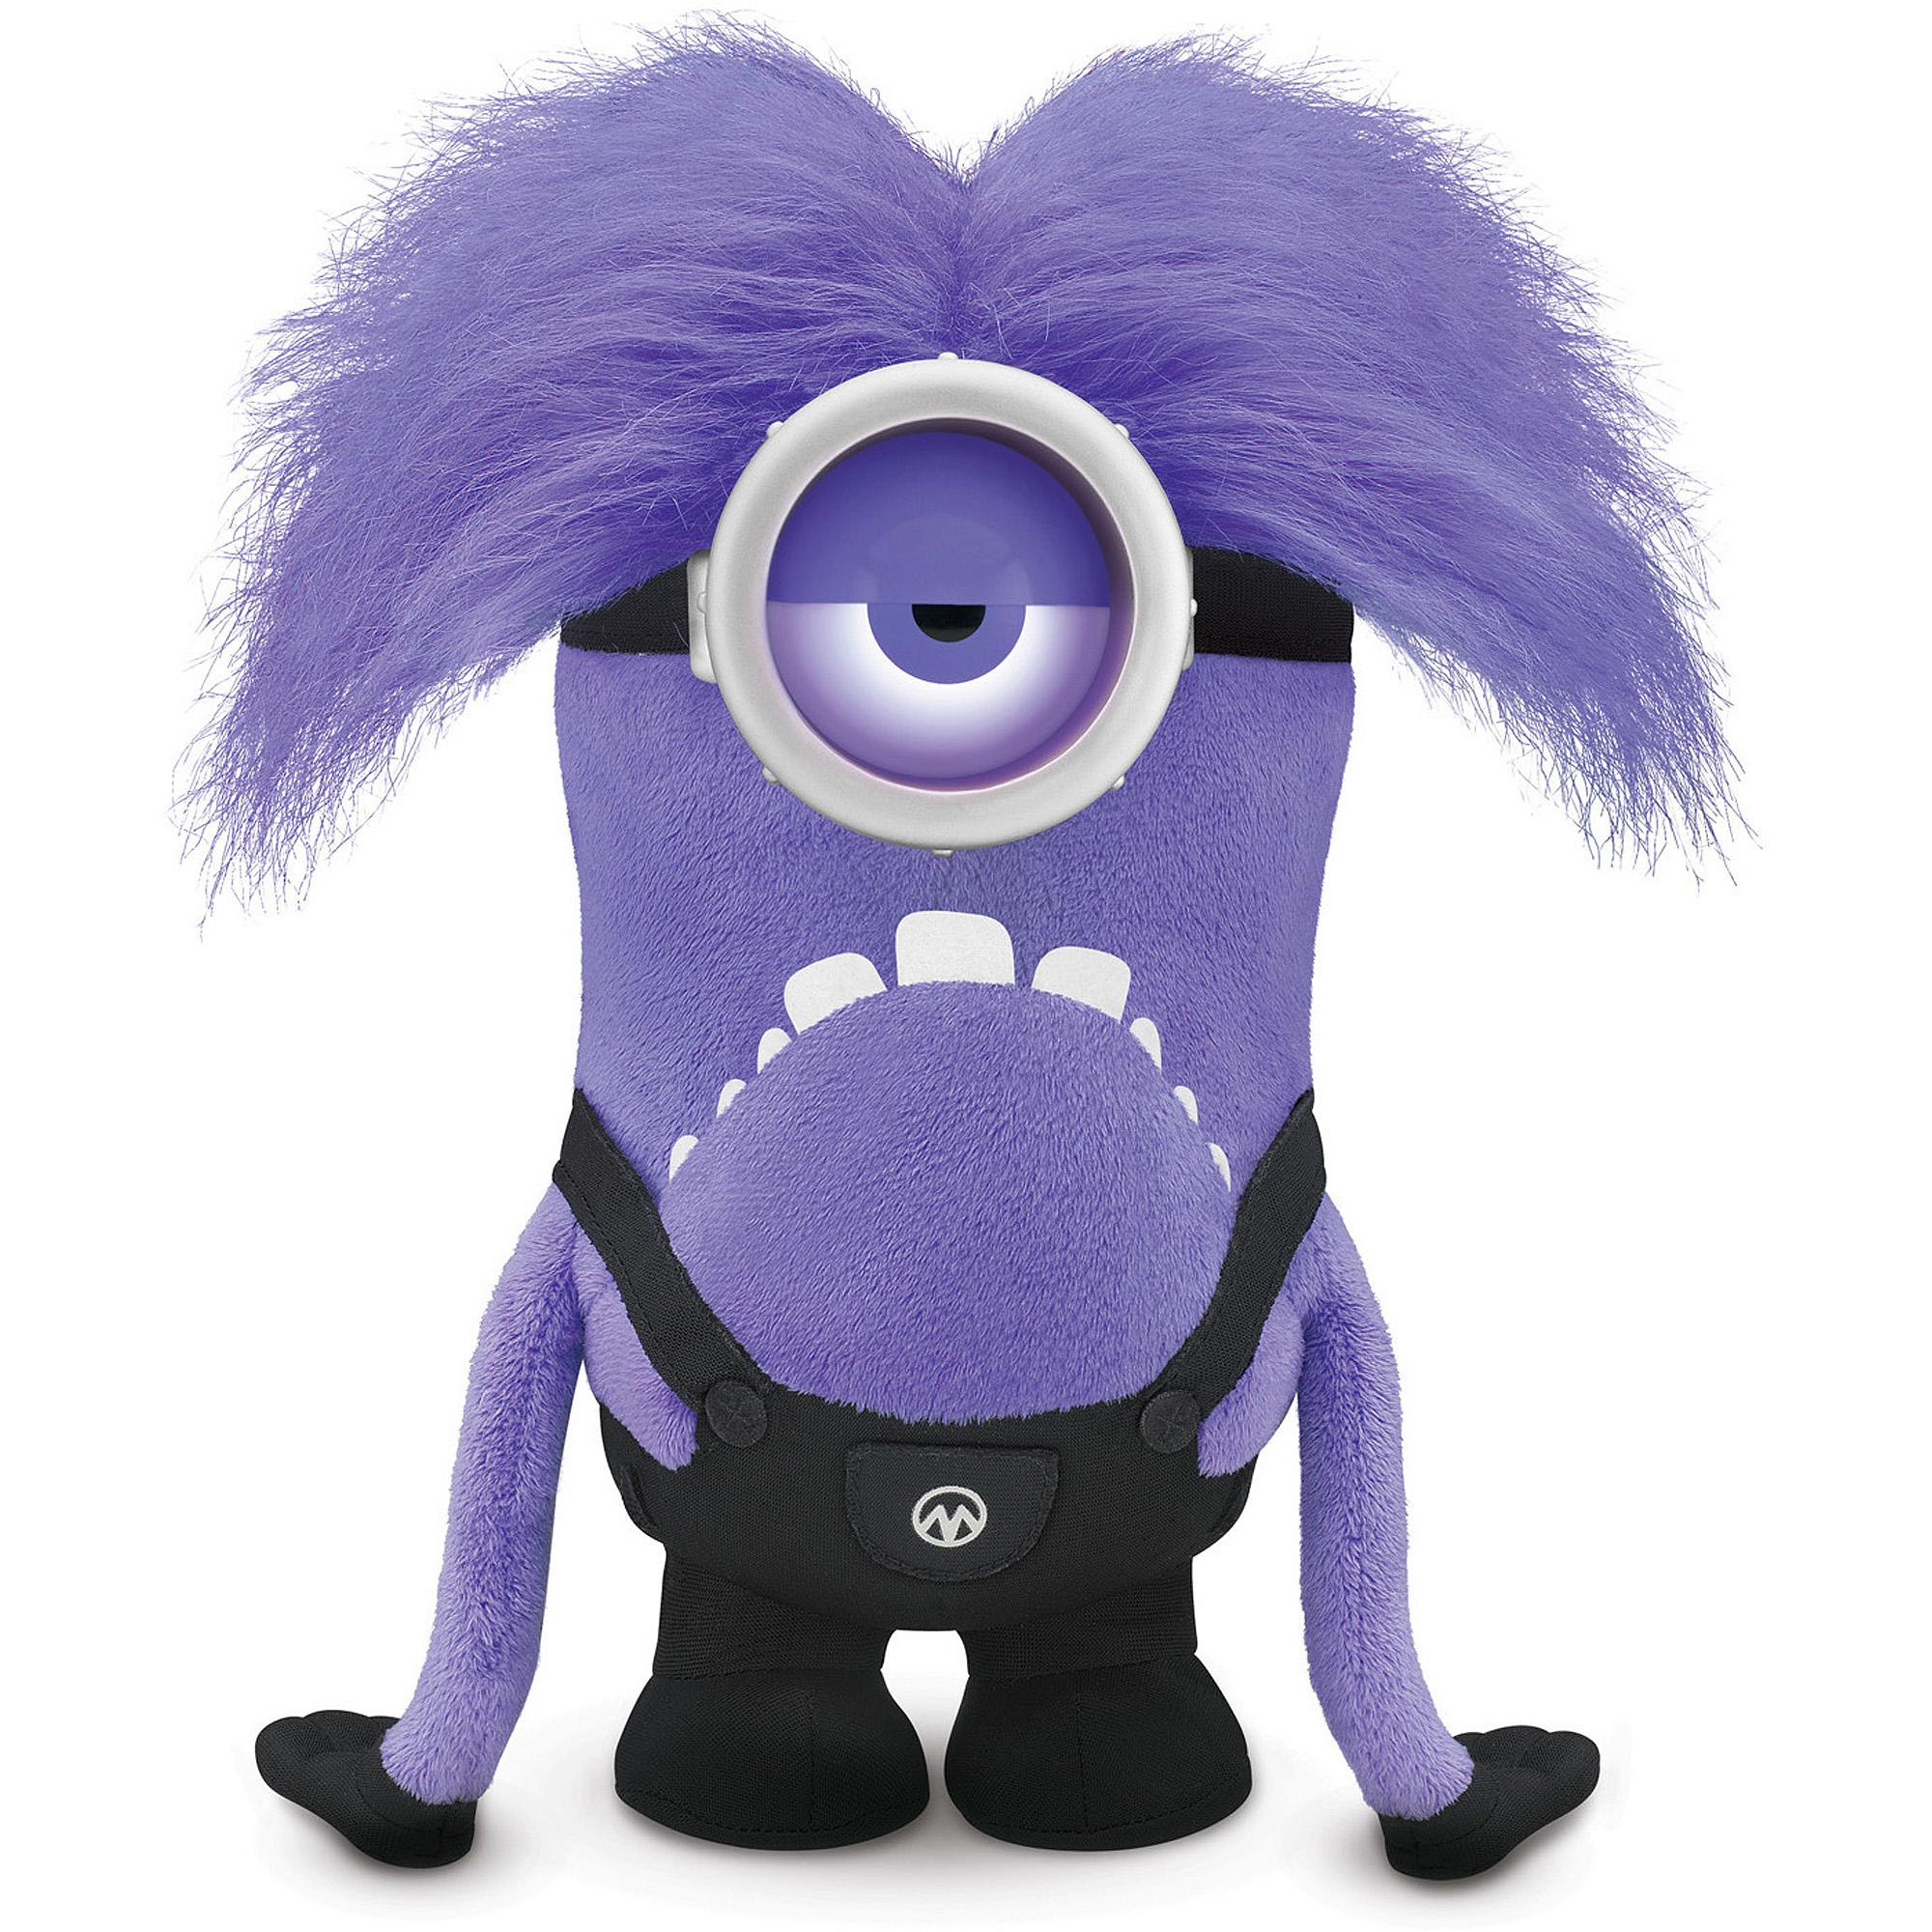 Despicable Me Talking Purple Minion Plush - Walmart.com | 450 x 450 jpeg 31kB